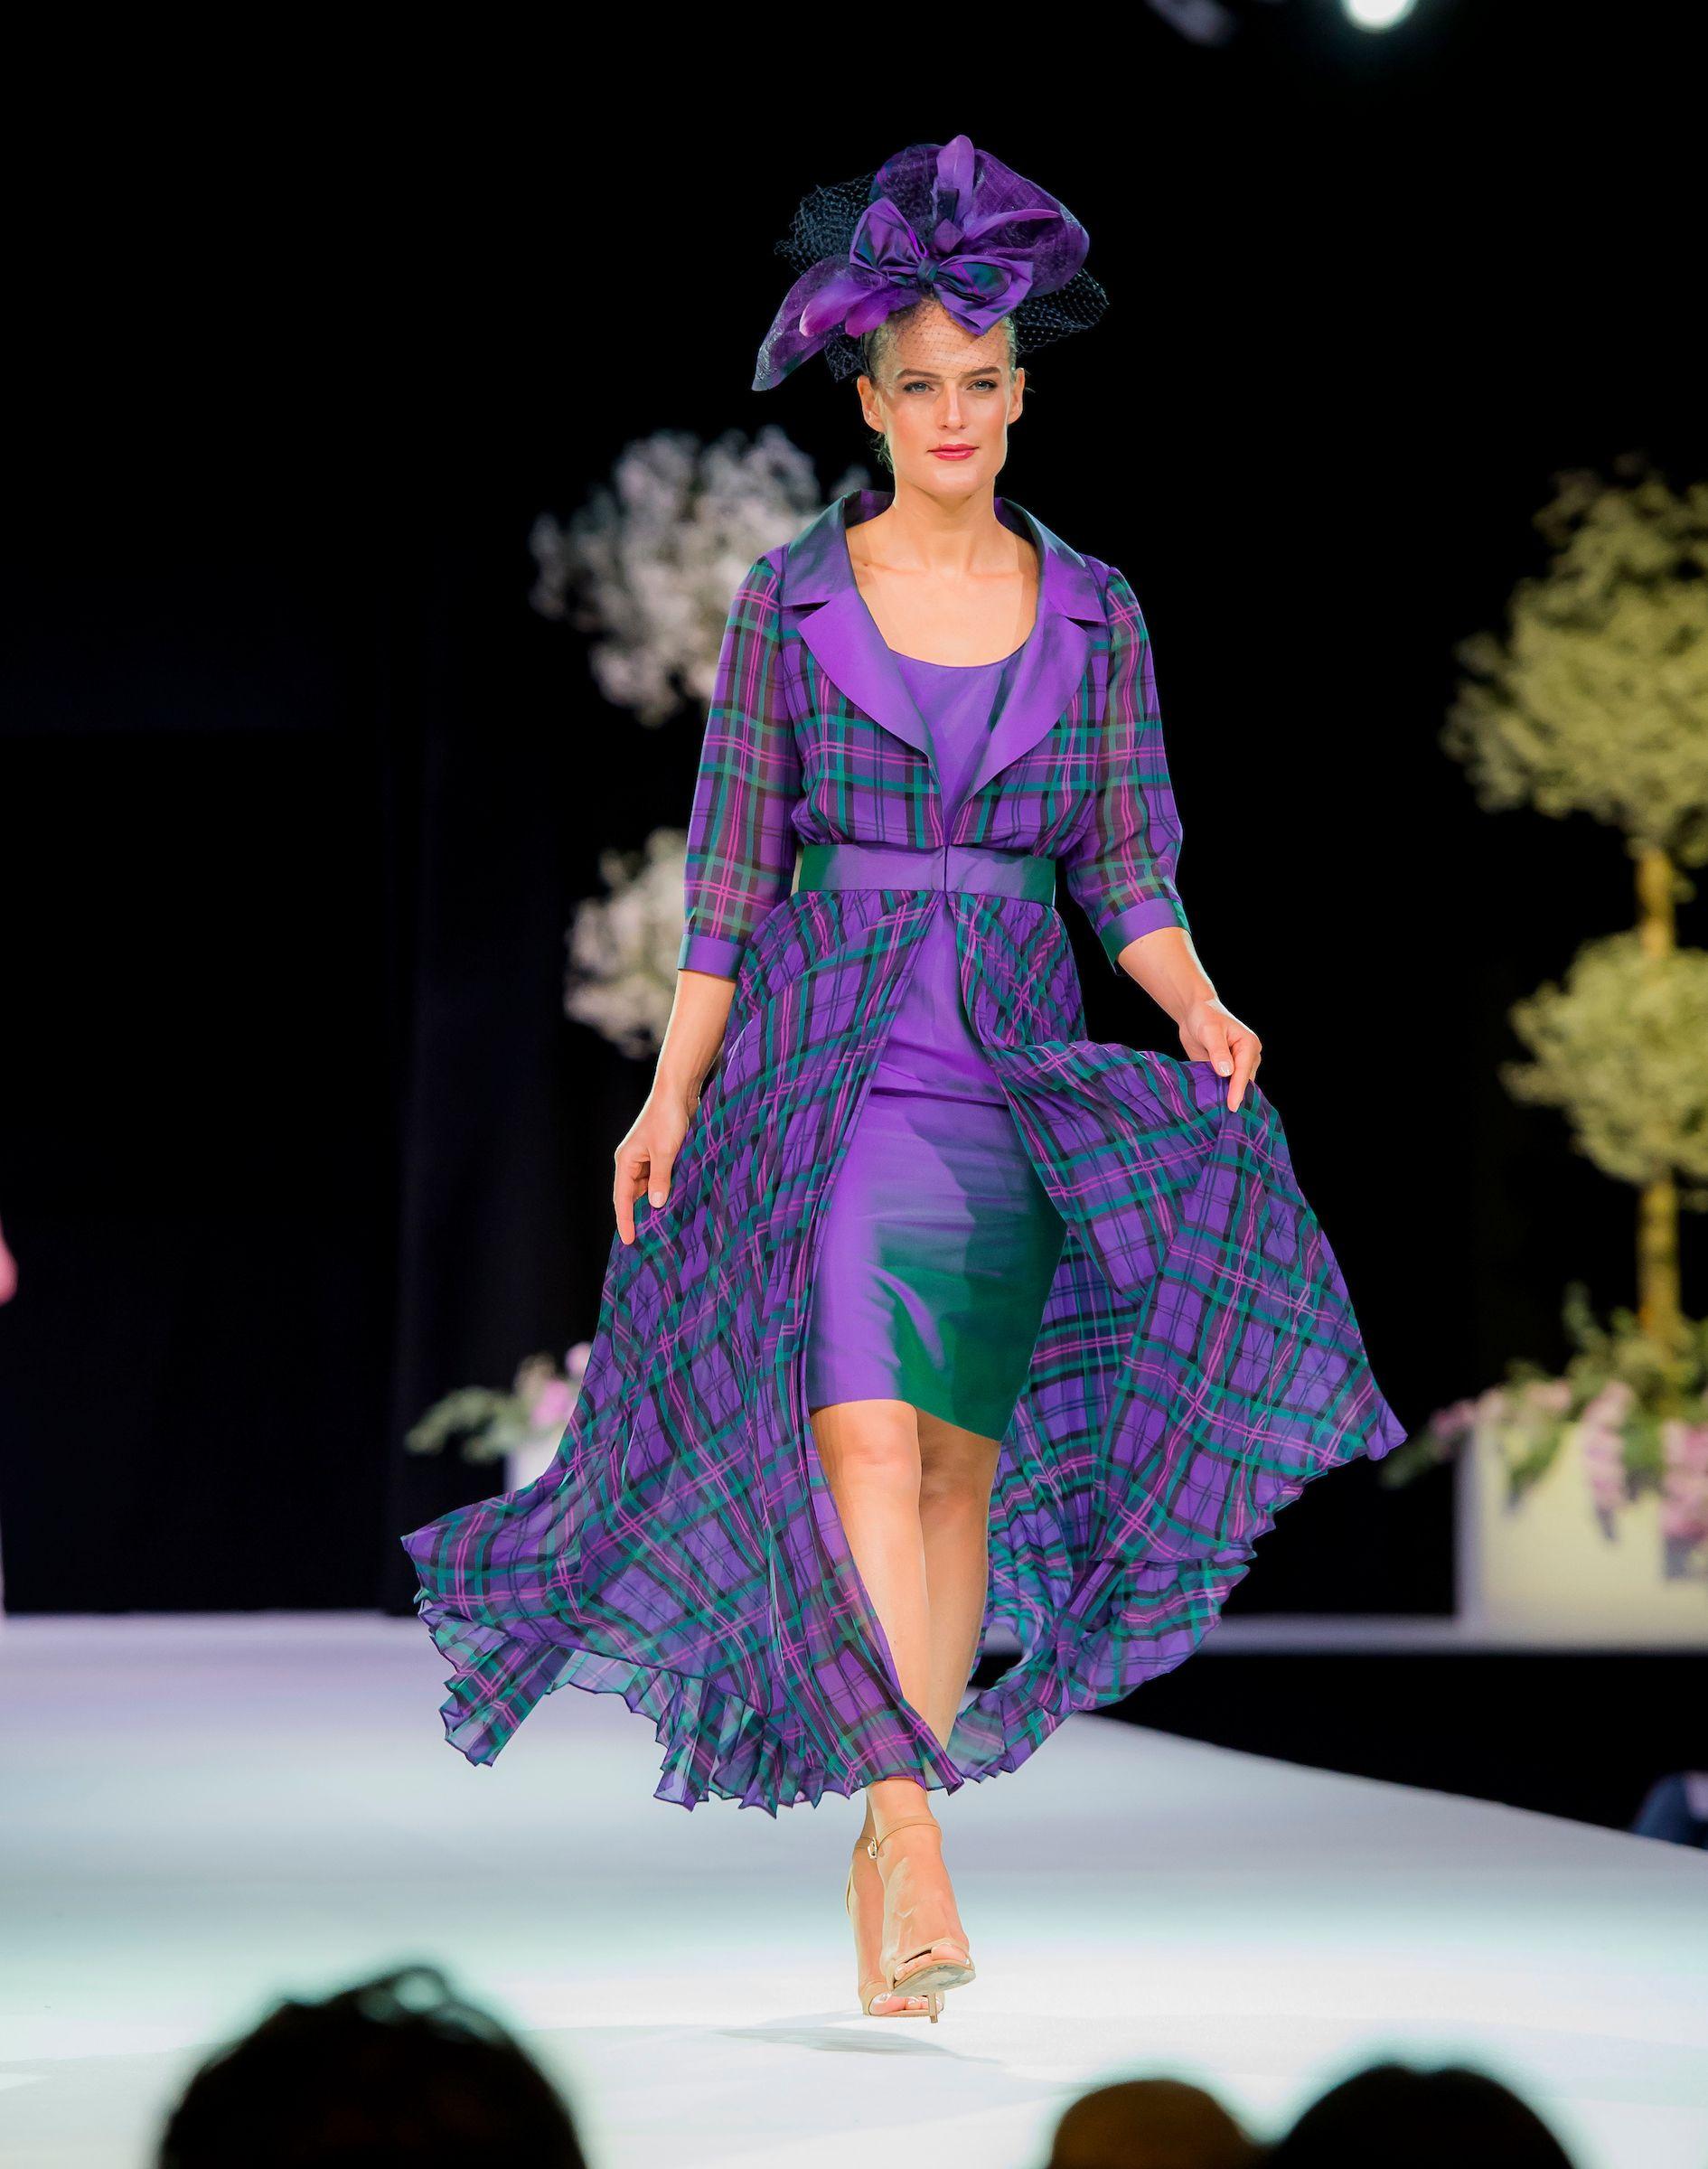 Scottish wedding dresses  Tartan chiffon dress and coat made to measure  Bridal  Pinterest